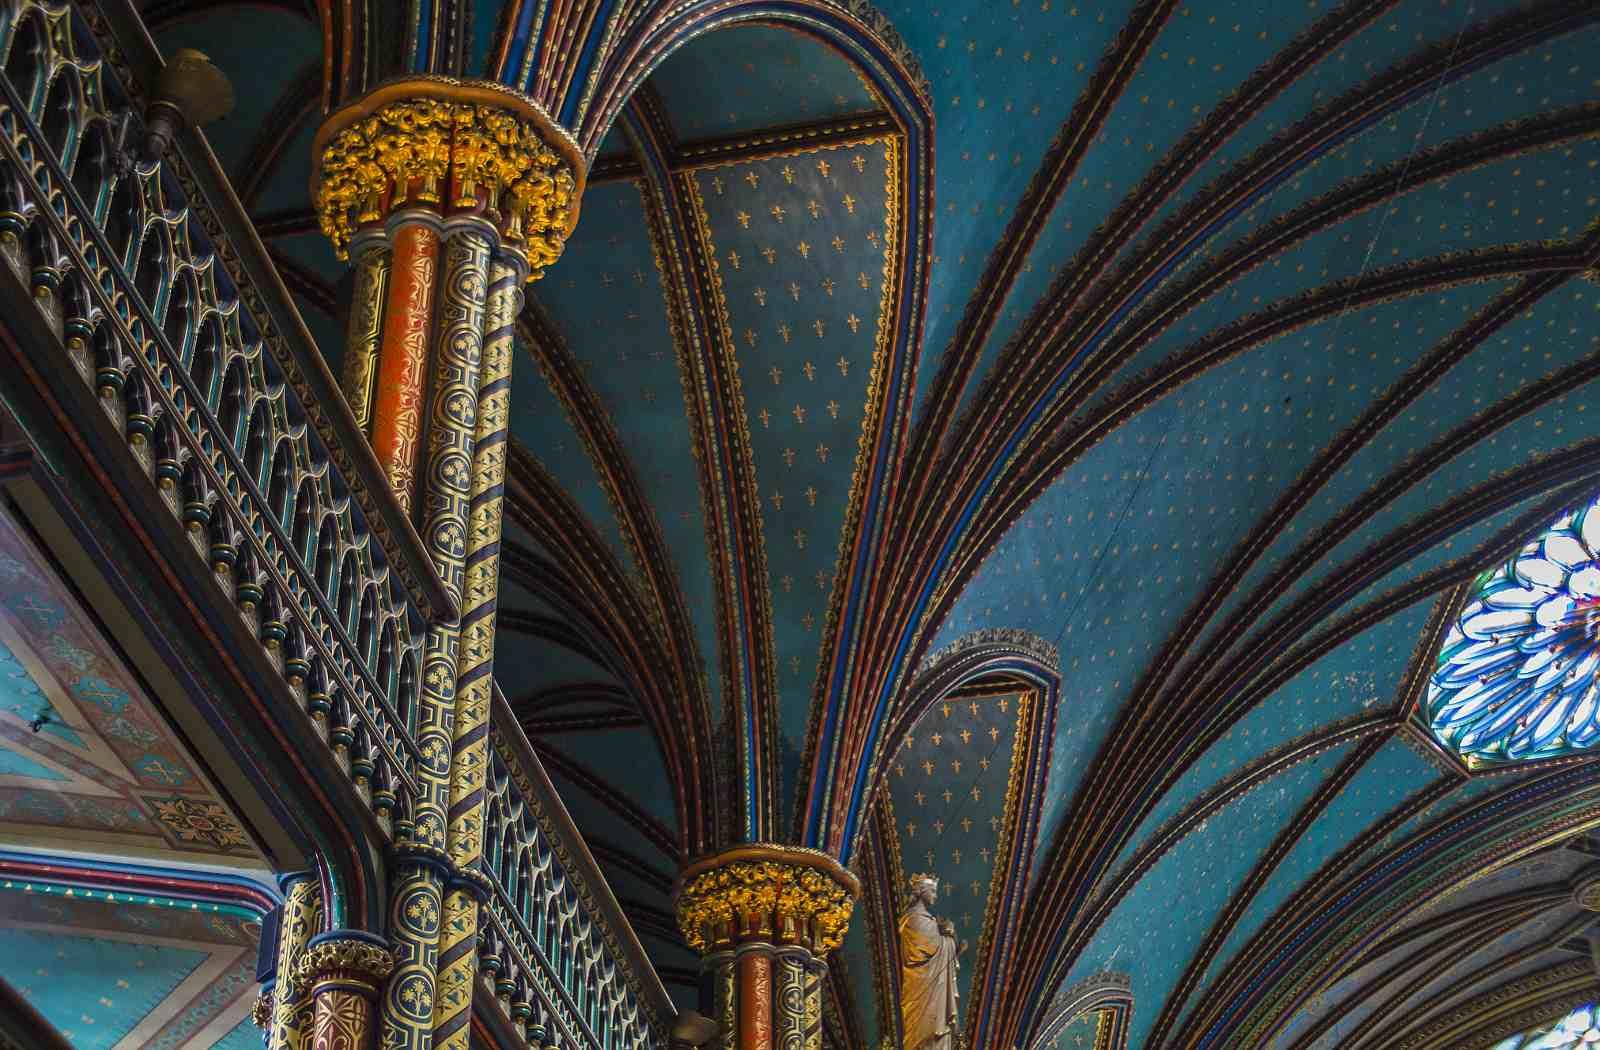 Inside Montreal's Notre-Dame Basilica.